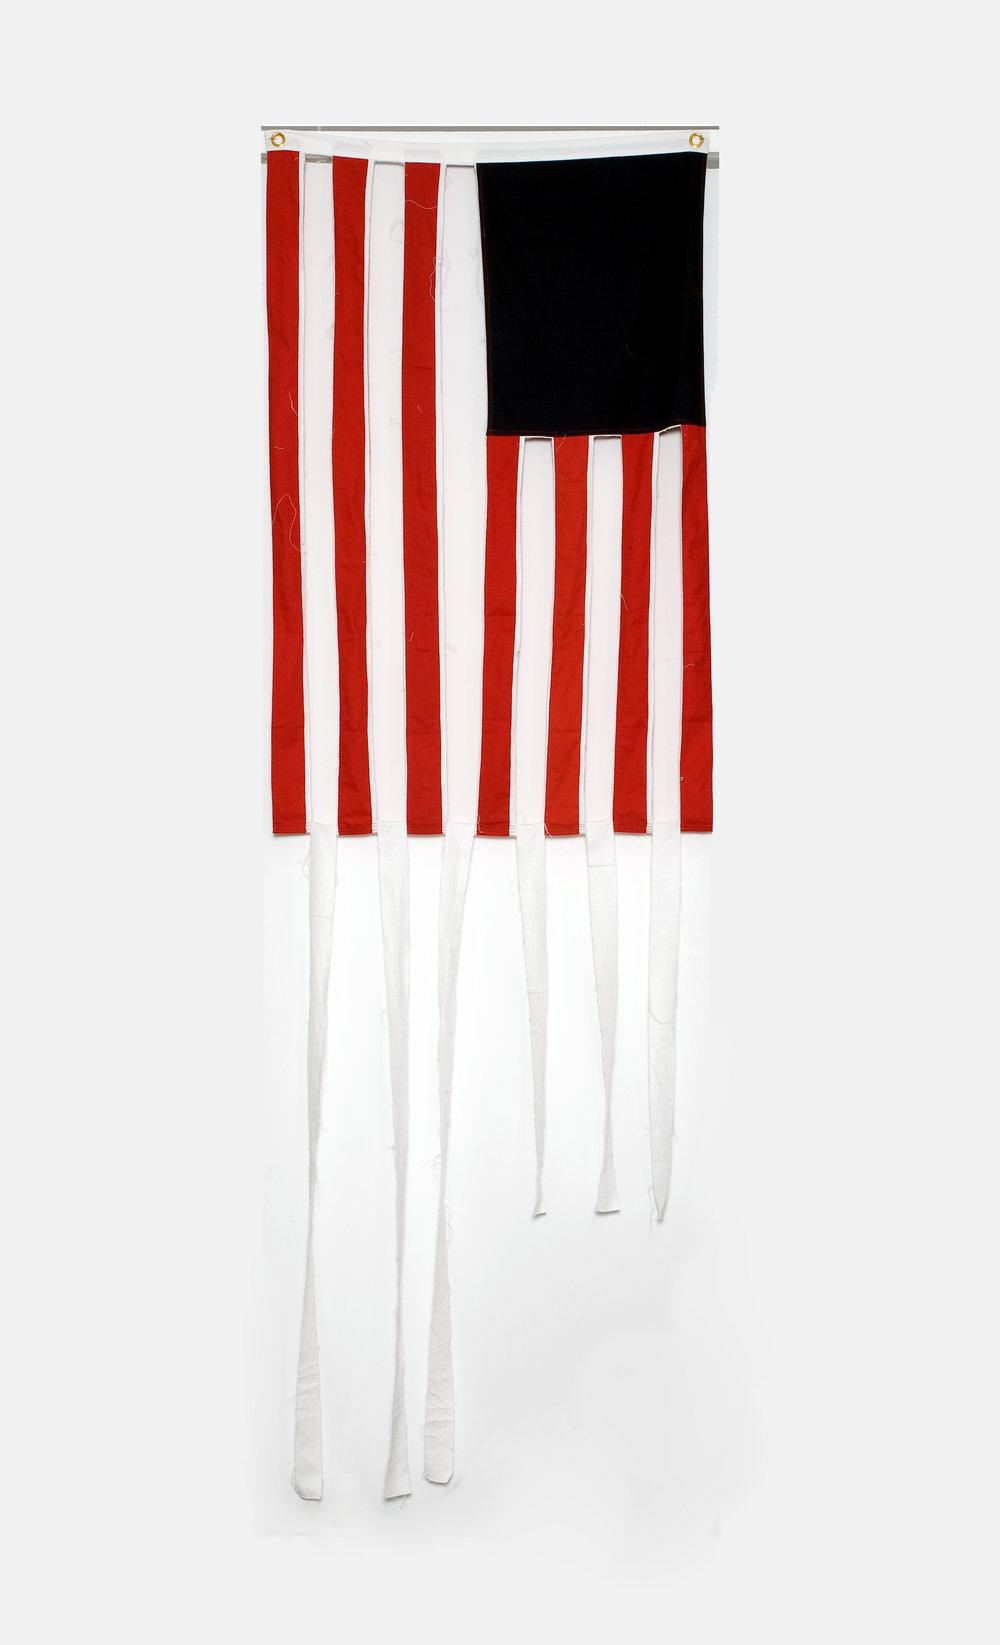 White Stripes, 2008 cotton canvas 152 x 91 cm - 59 7/8 x 35 7/8 inches